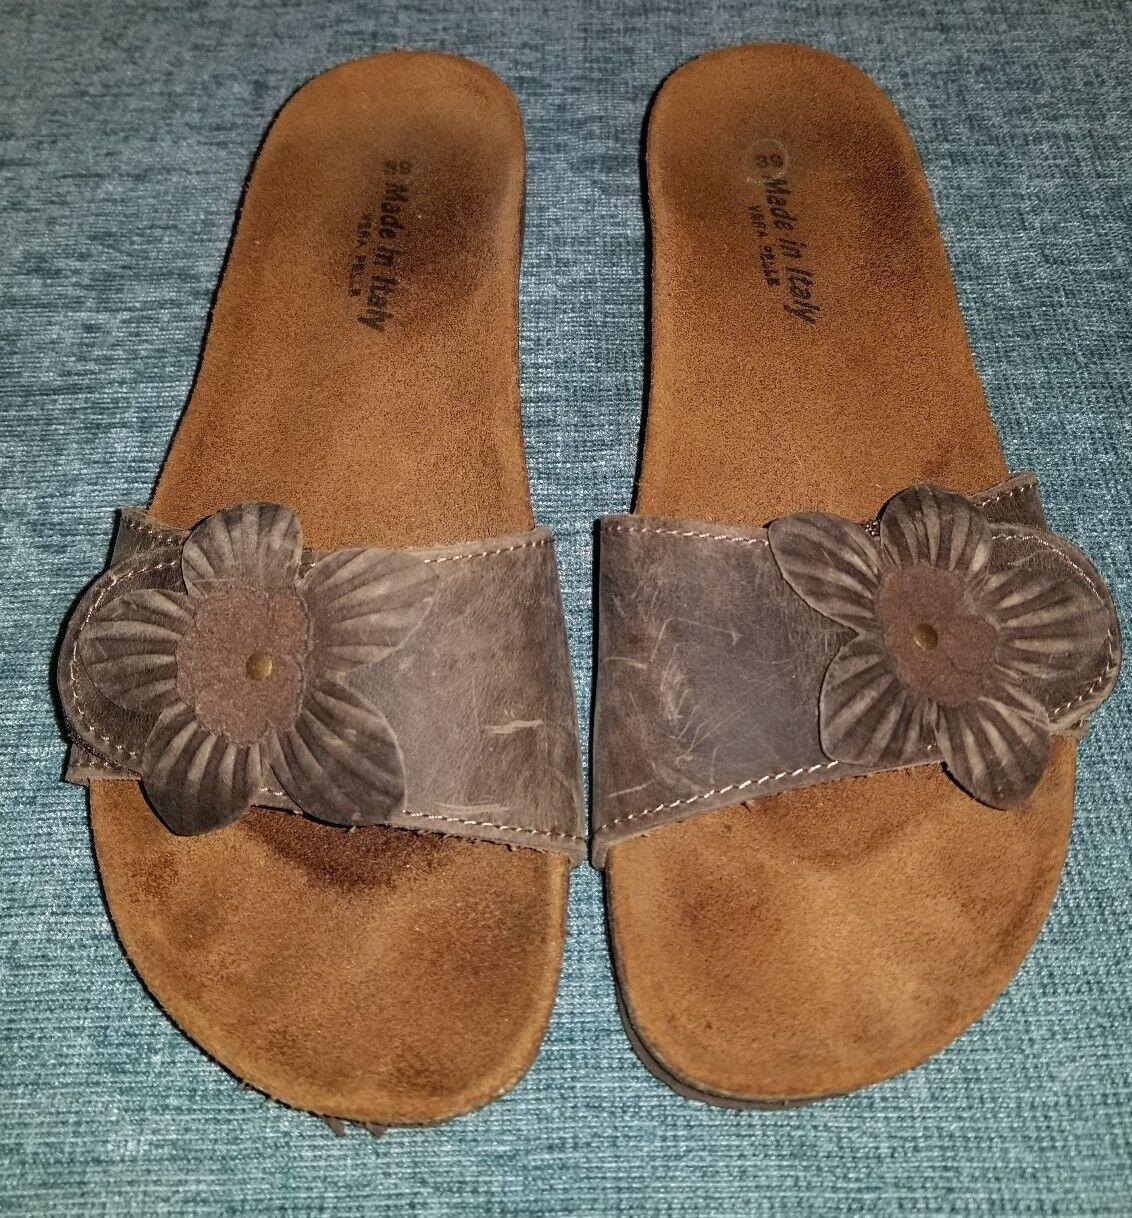 VERA PELLE Brown Leather Slides Sandals w/ Euro Flower Design Cork Wedge Euro w/ Sz 38 01e2fb